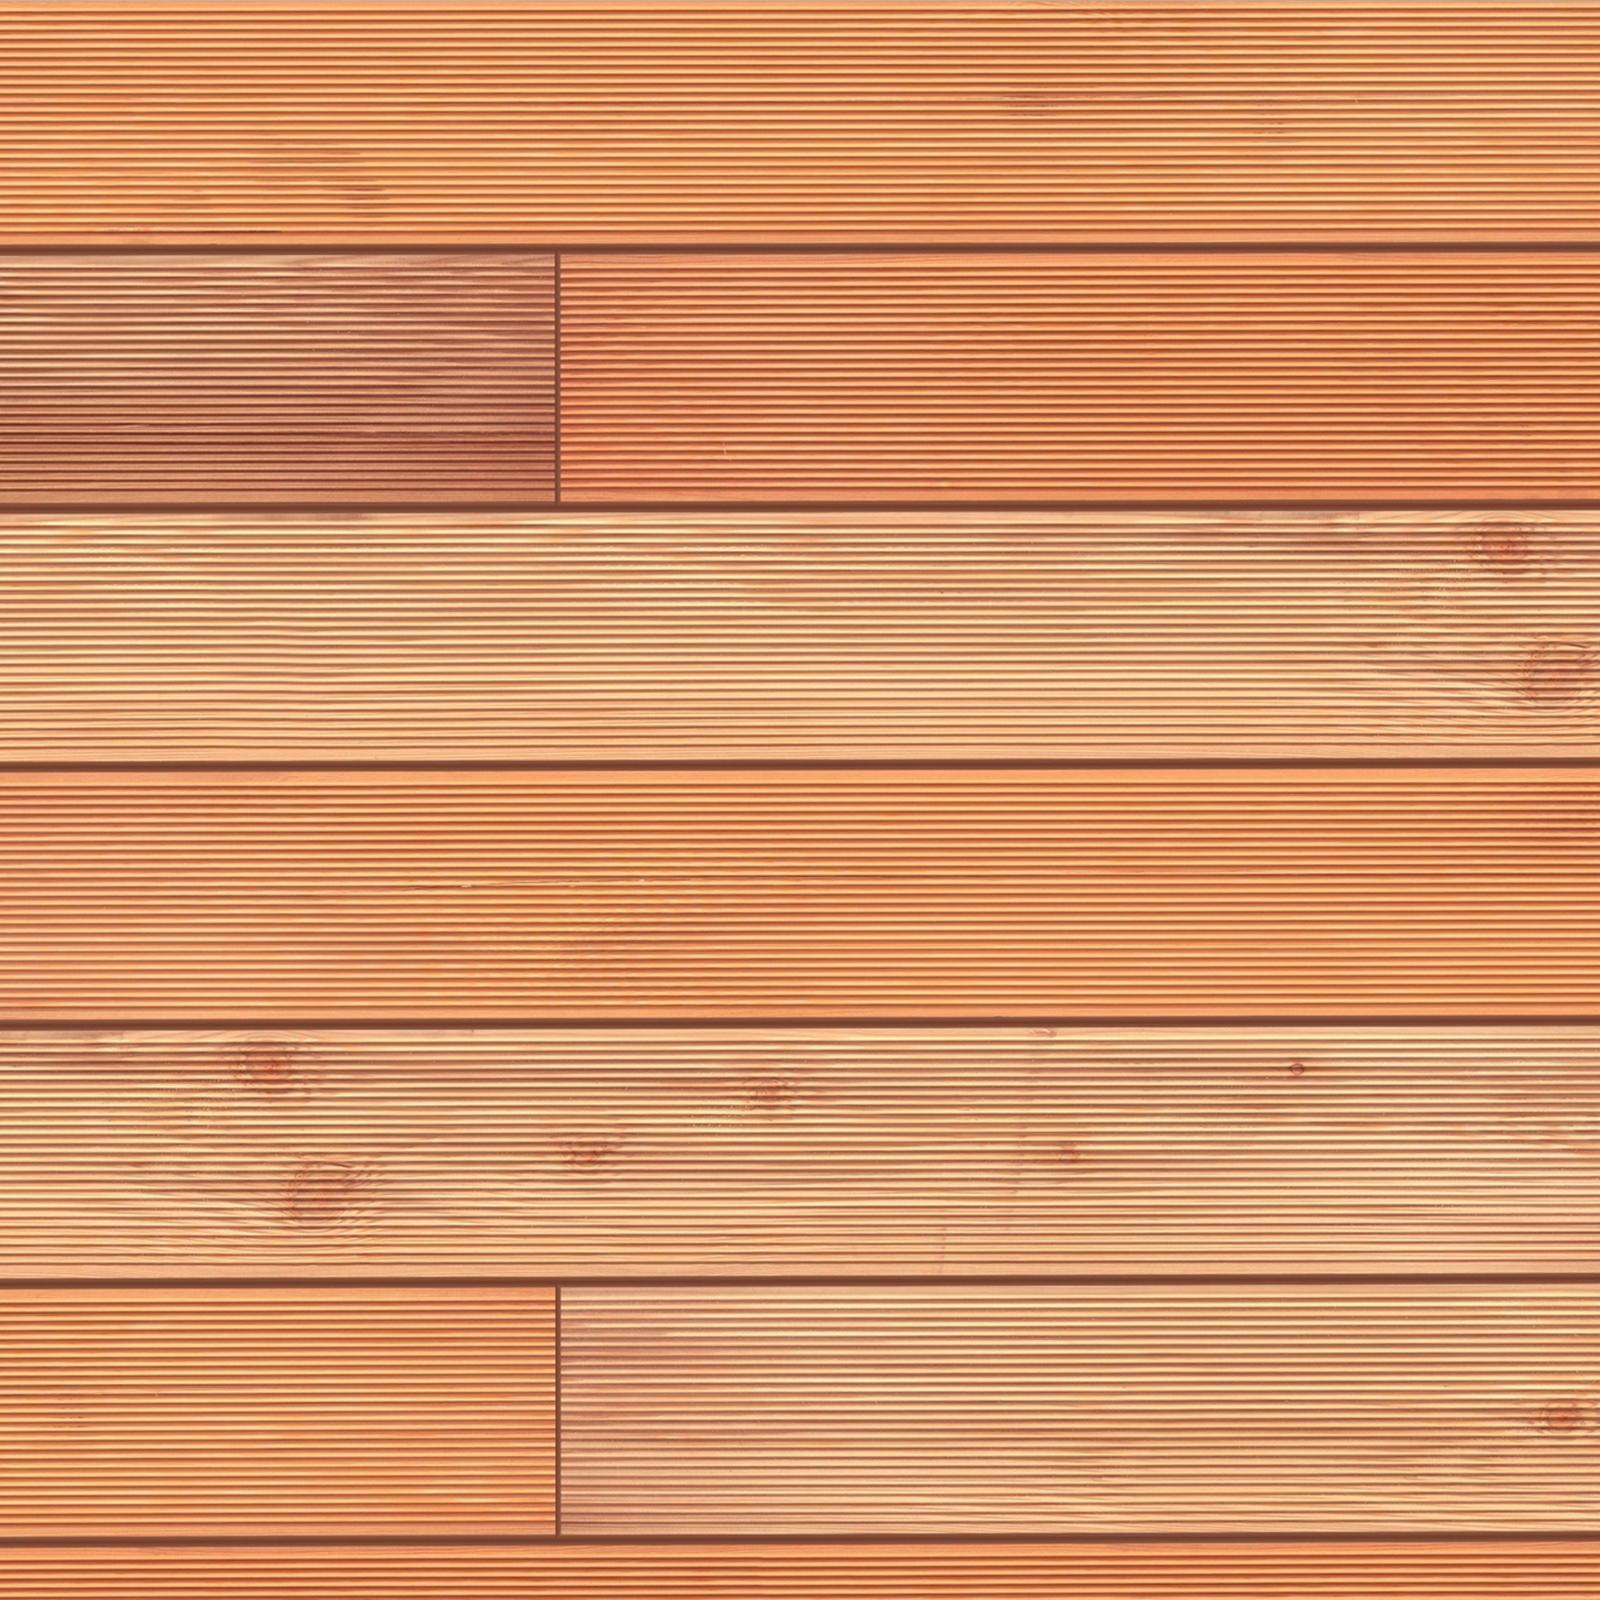 Terrassendiele-Holz-Douglasie-massiv-Komplettset-Komplettbausatz-5-100-m